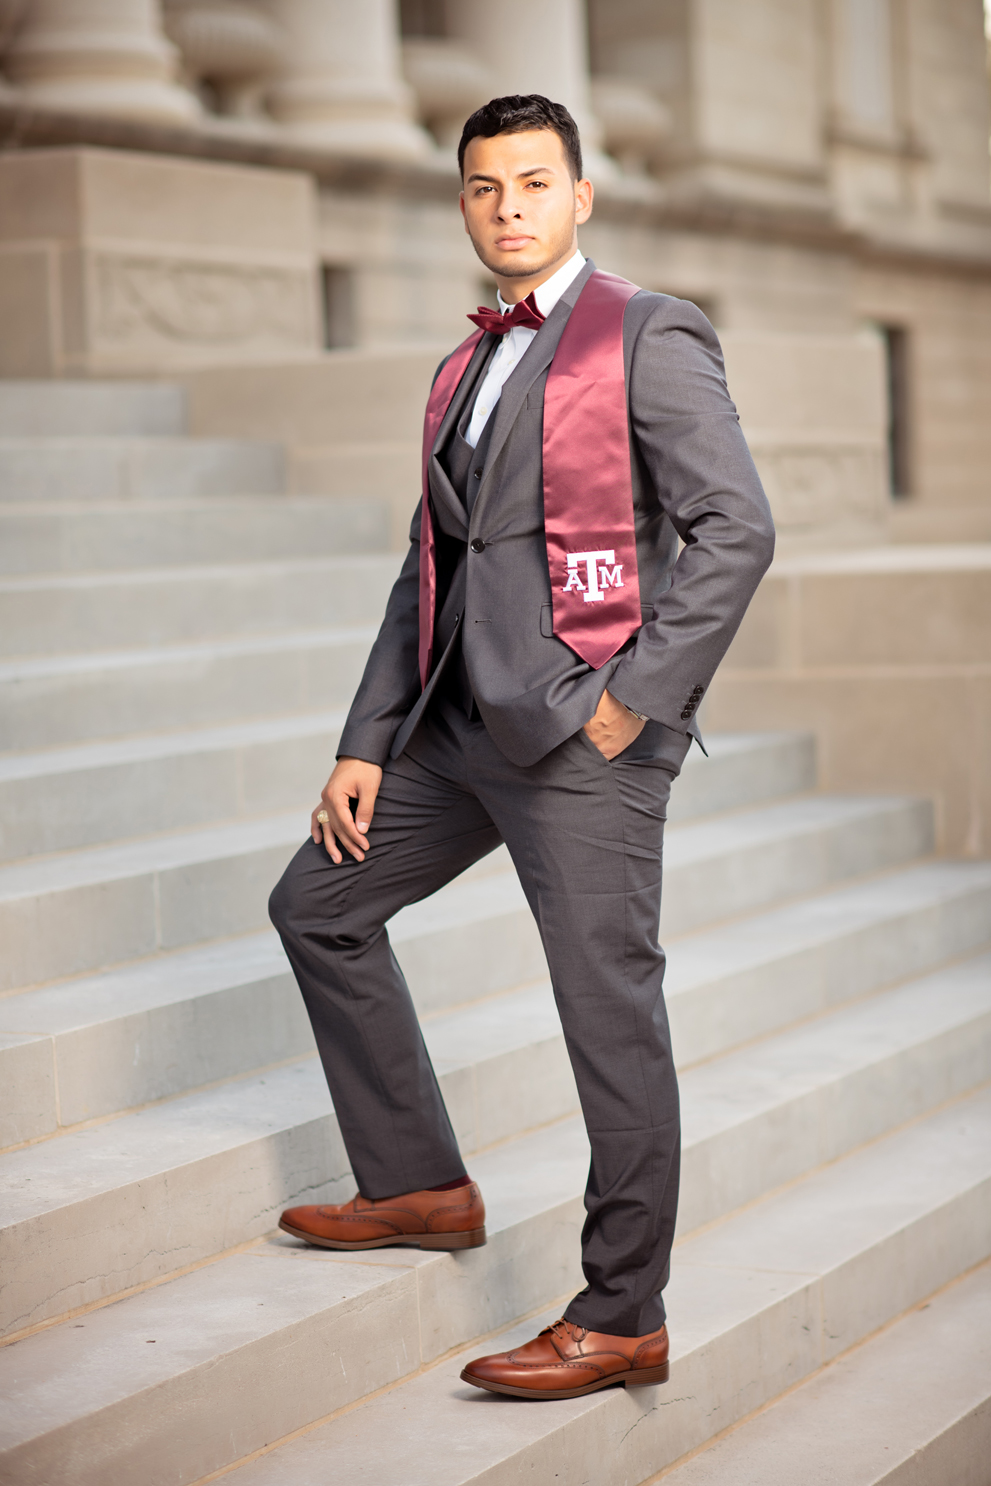 Graduation-Wedding-Engagement-Texas-Aggie-College-Station-Photographer-30031.jpg